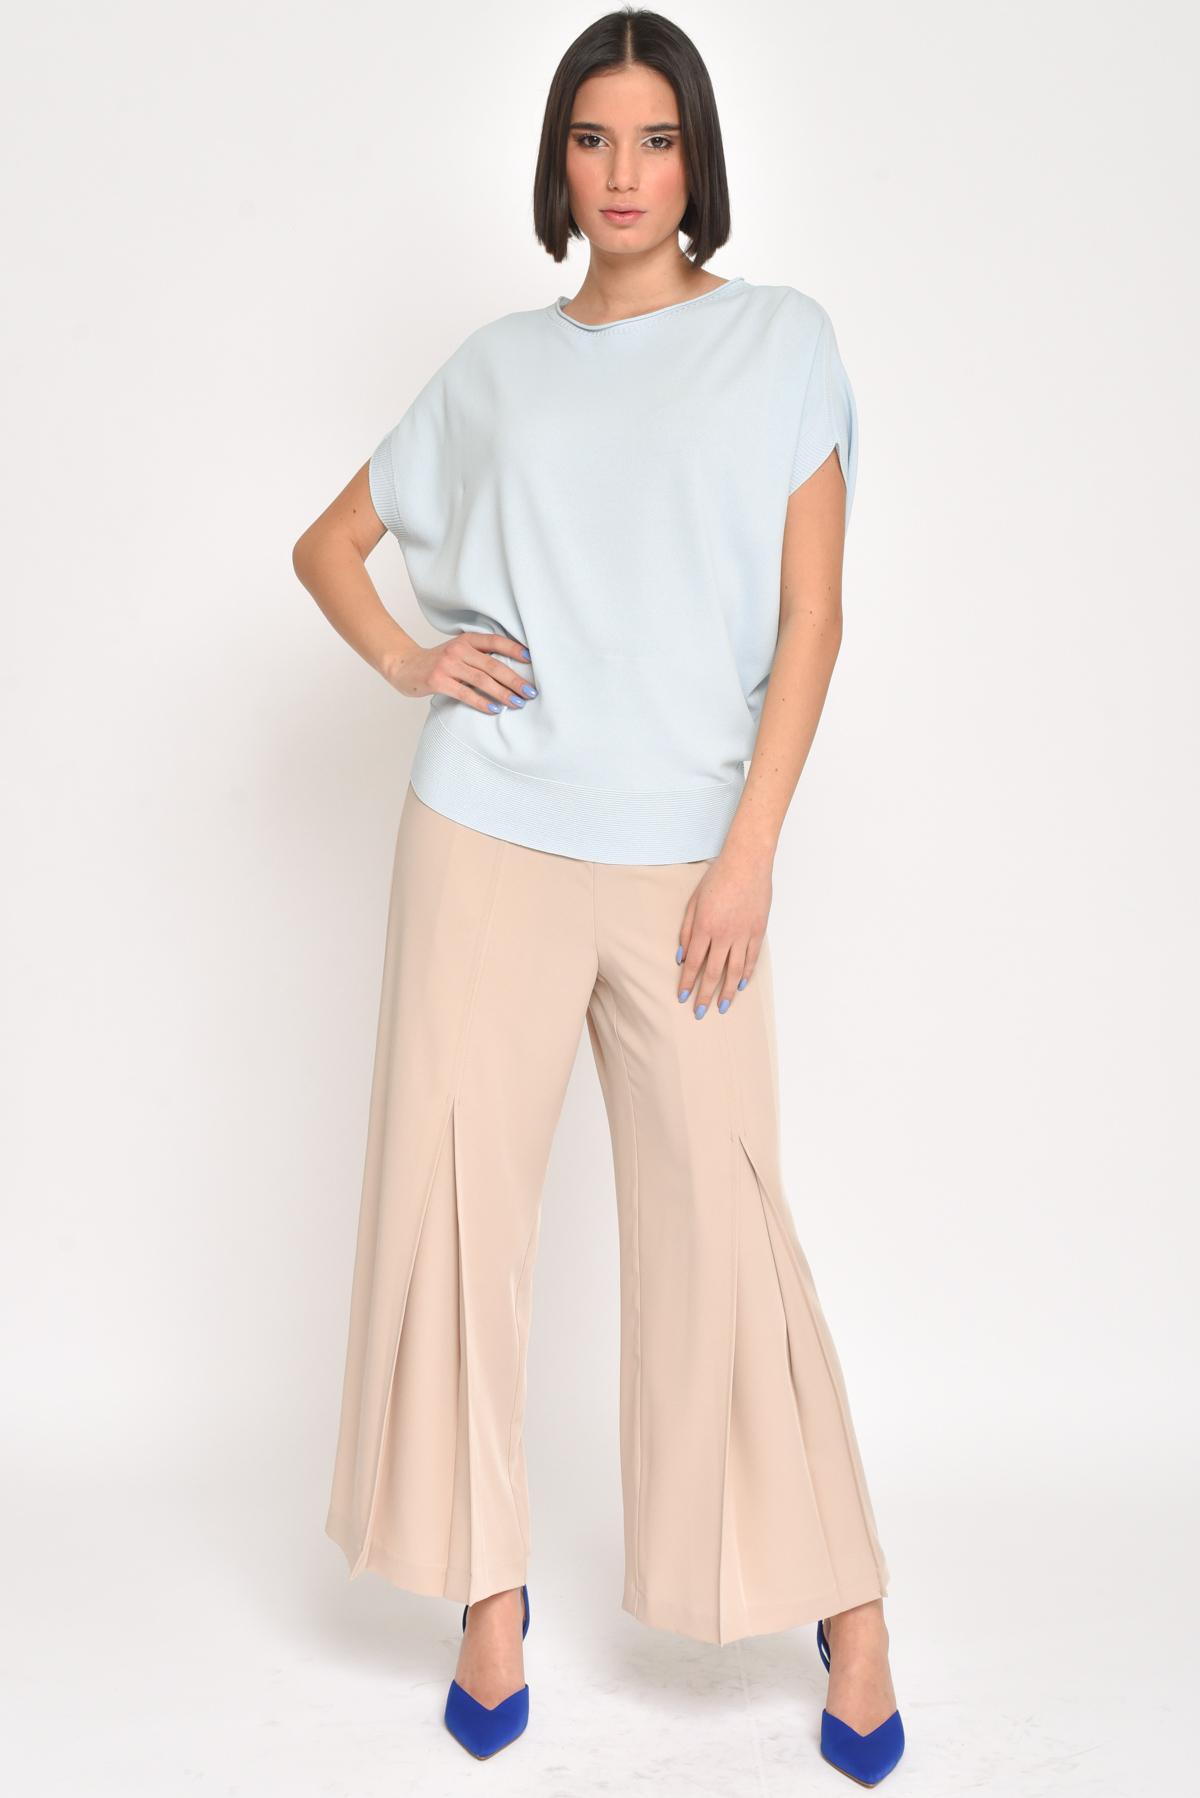 OVERSIZE KIMONO SWEATER for women - LIGHT BLUE - Paquito Pronto Moda Shop Online